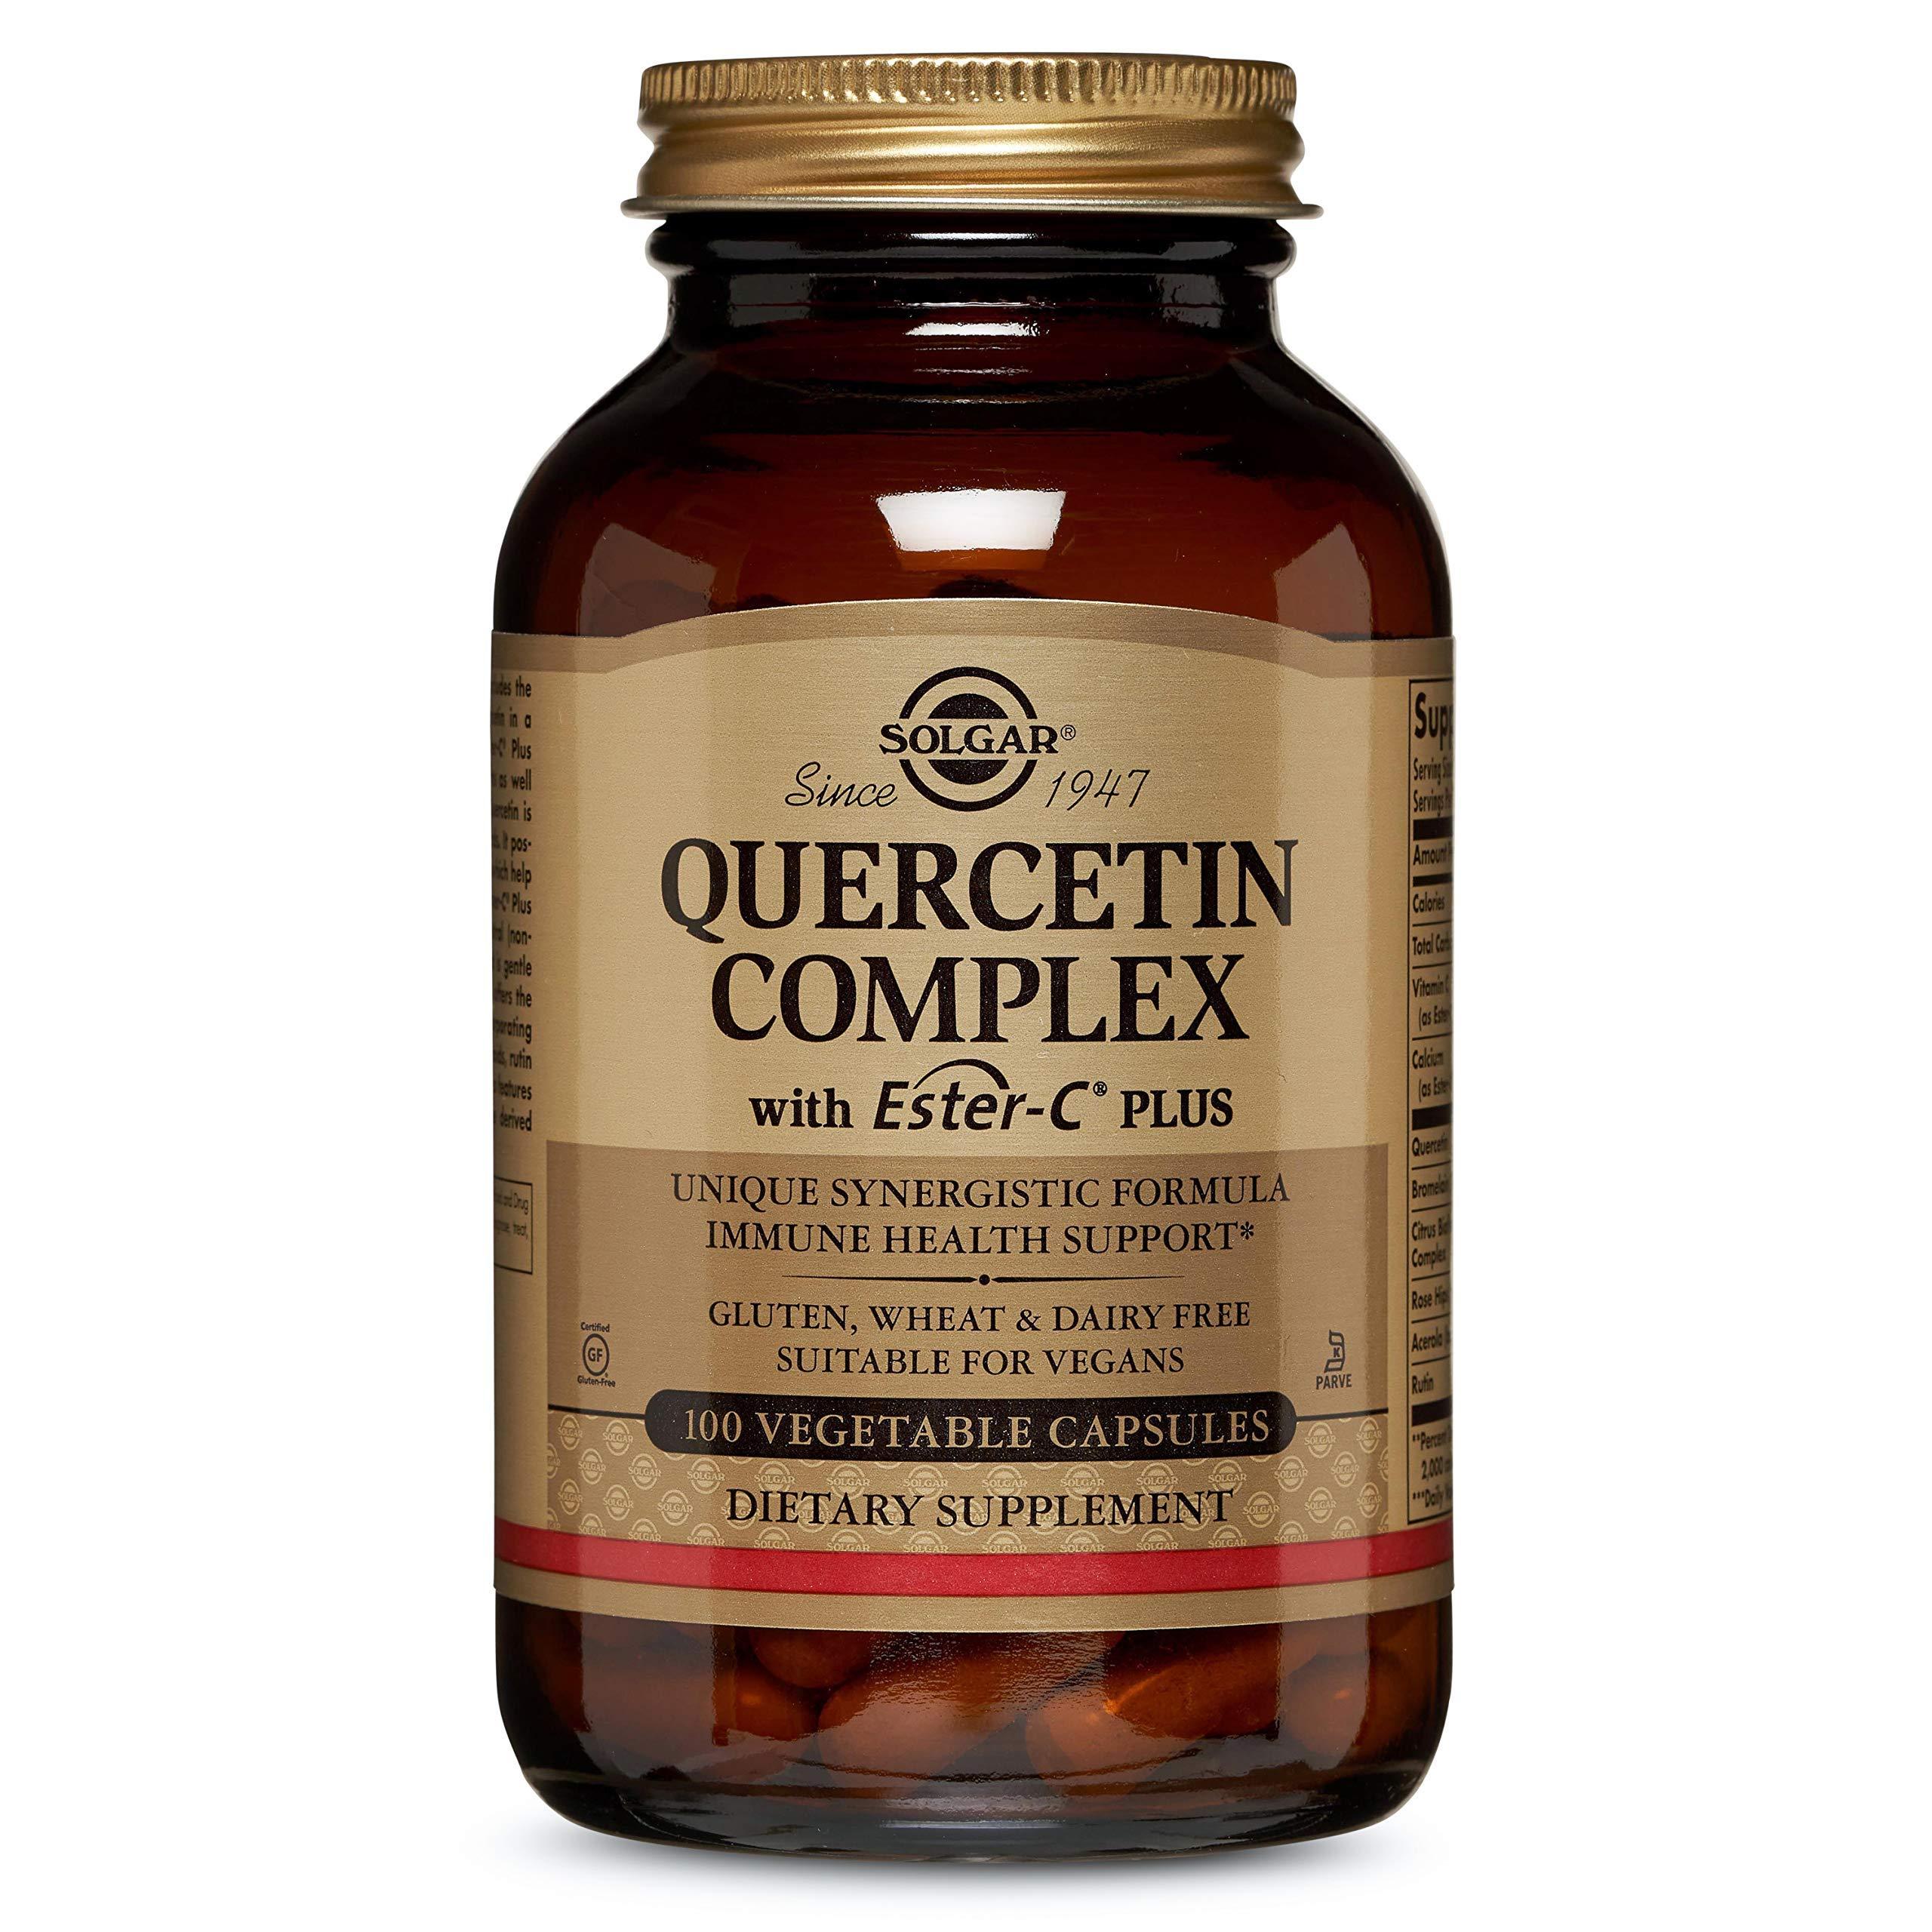 Solgar Quercetin Complex with Ester-C® Plus, Unique Synergistic Formulat Immune Health Support, 100 Vegetable Capsules by Solgar